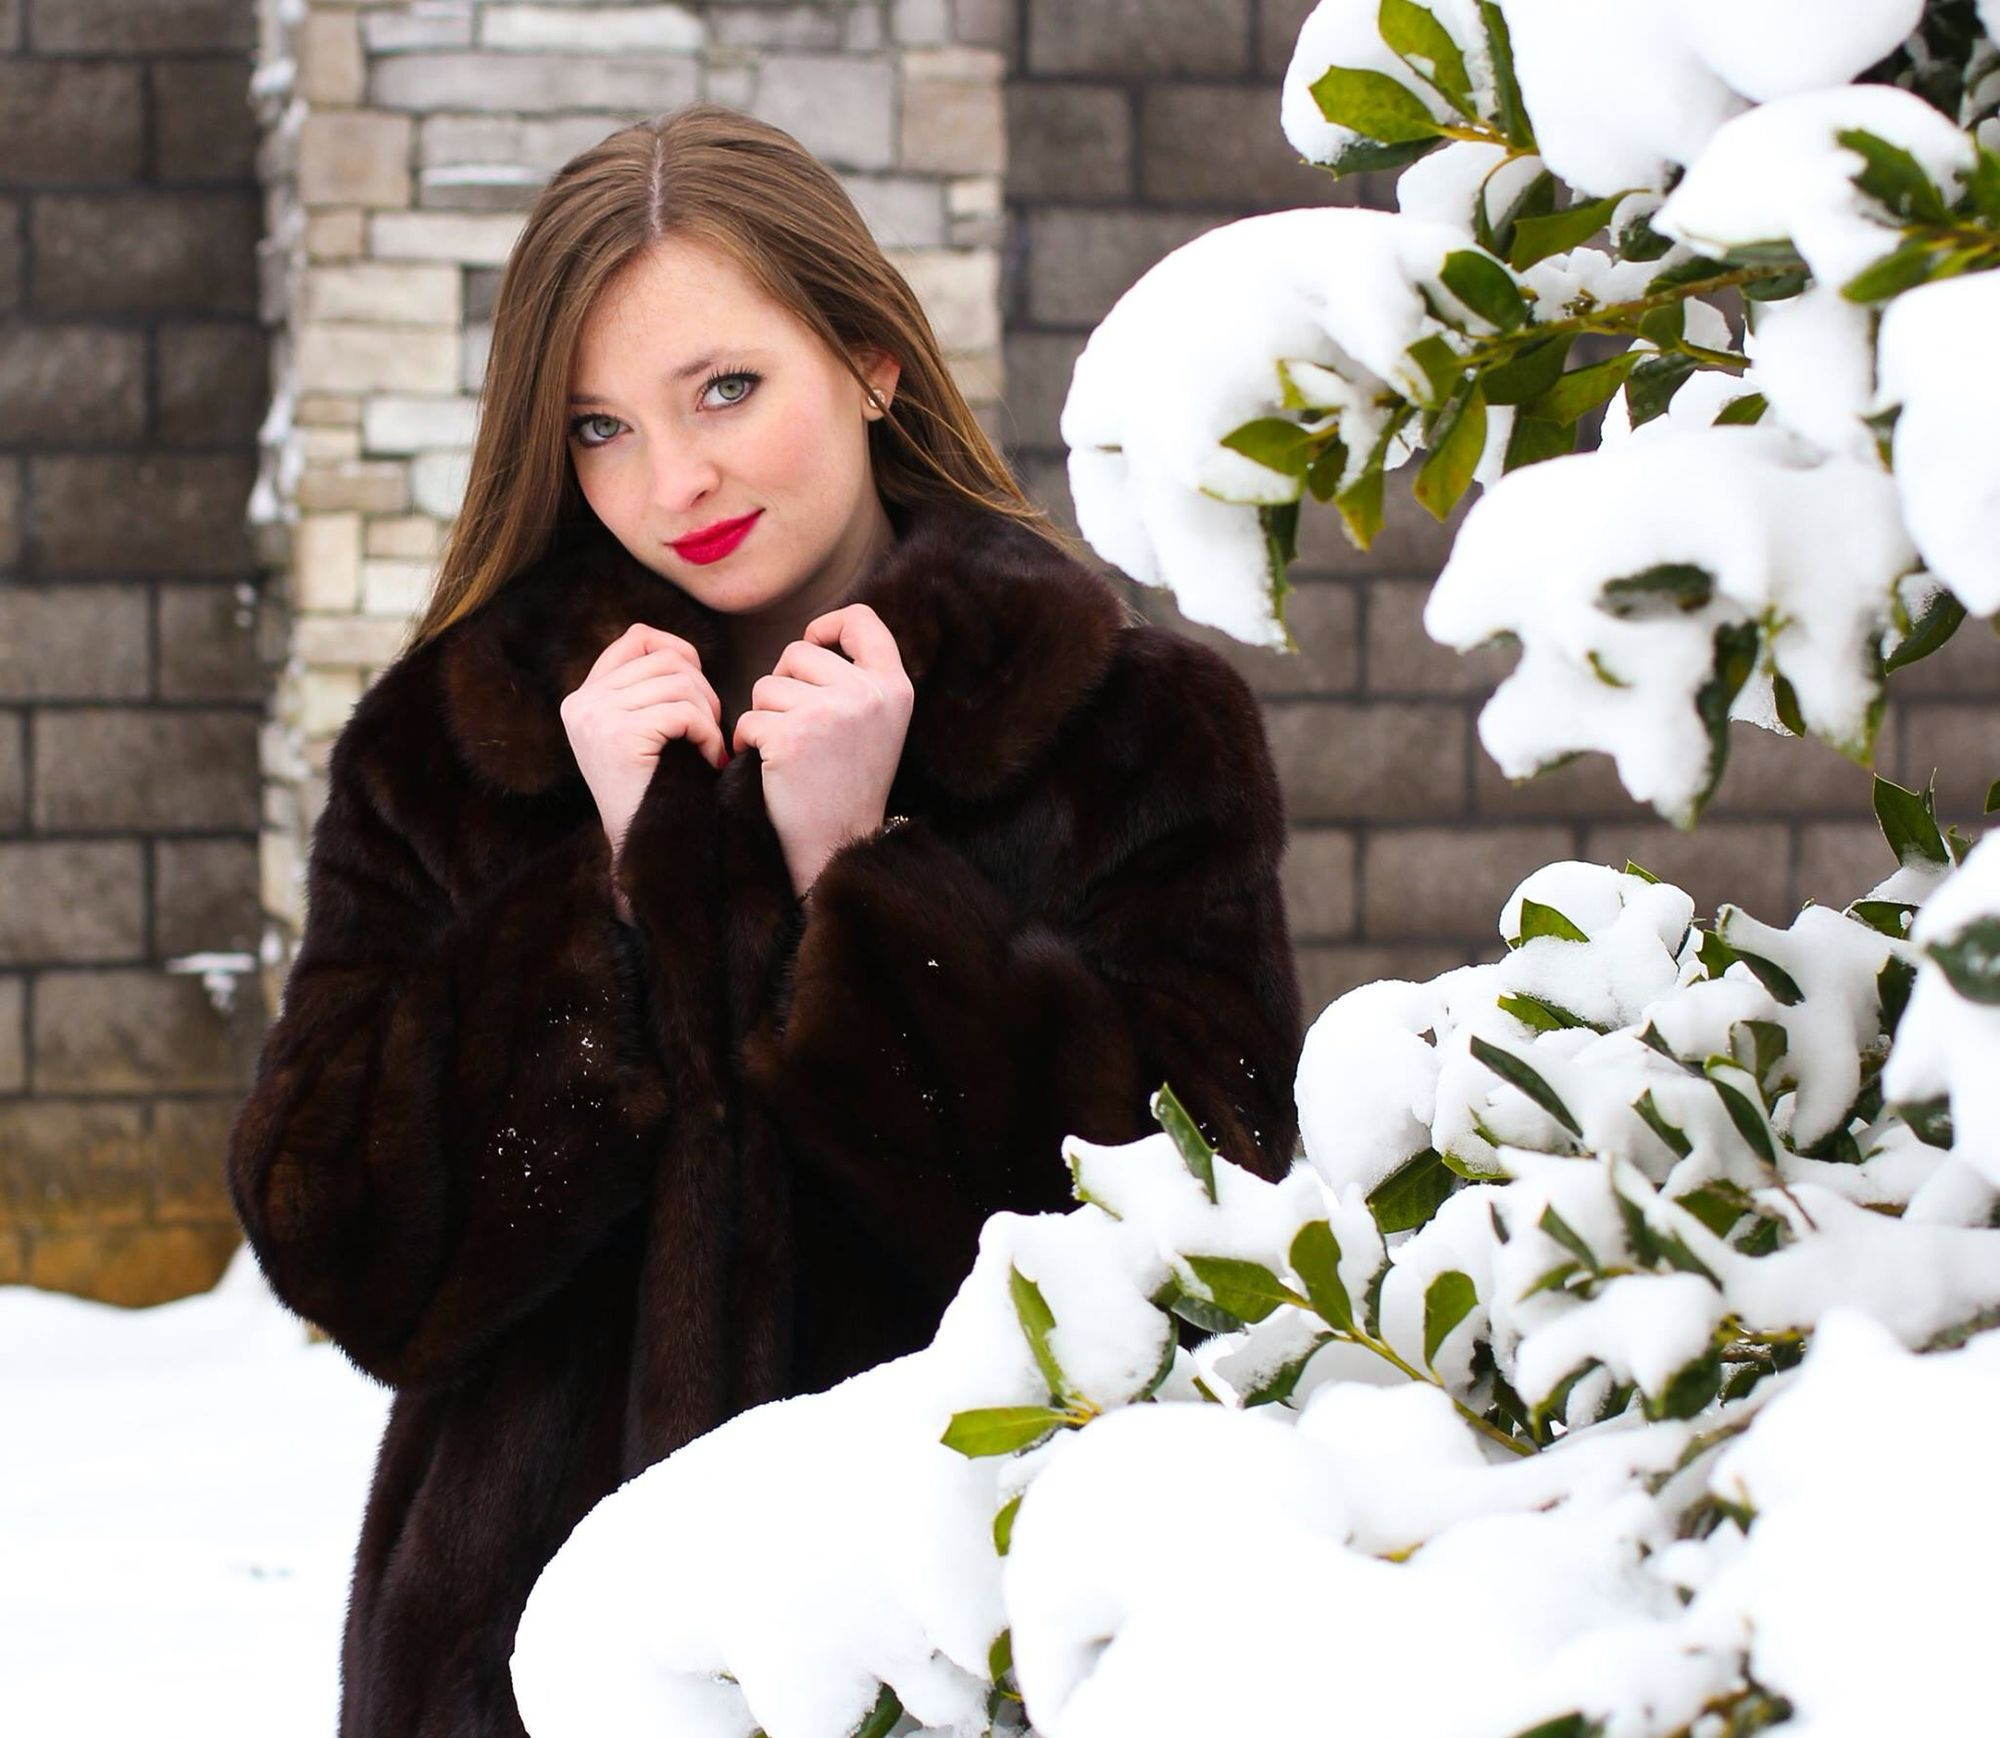 Red lips mink coat model snow